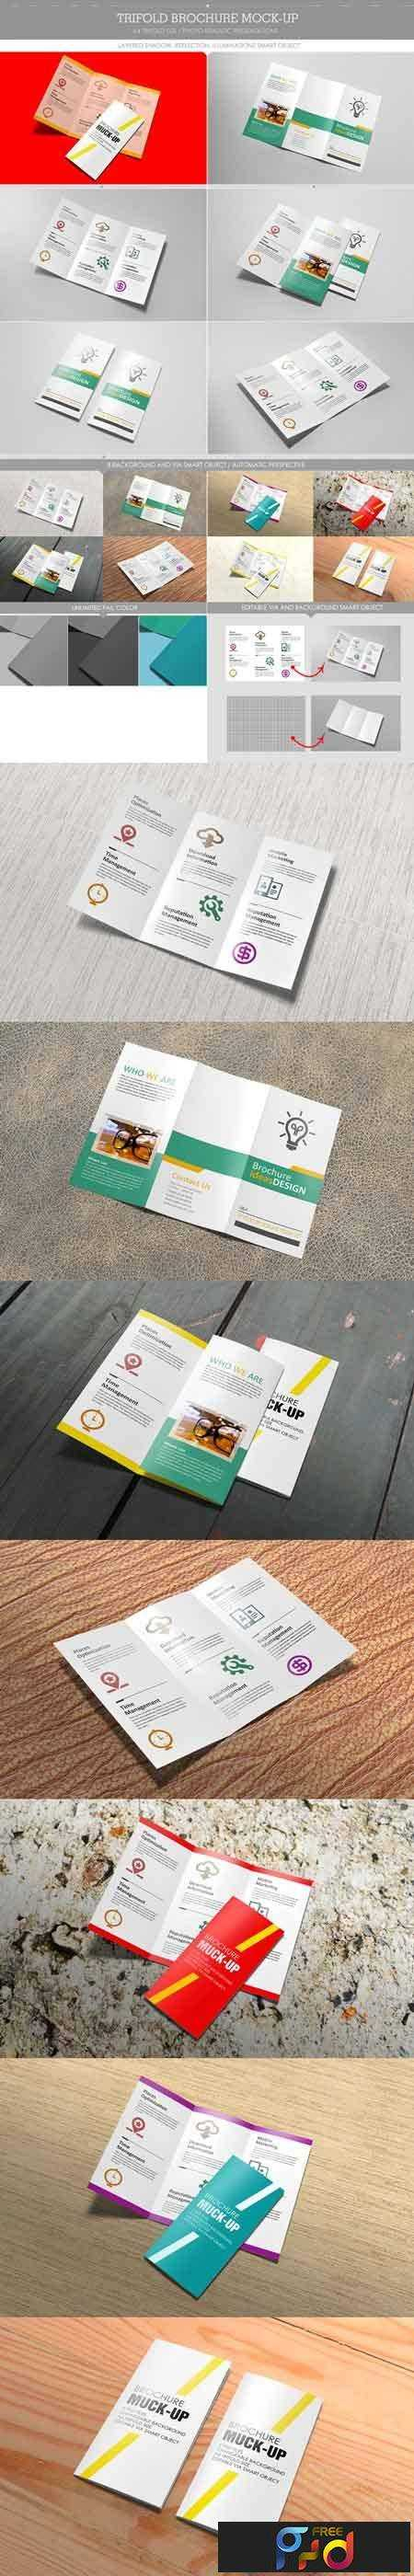 FreePsdVn.com_1705166_MOCKUP_trifold_brochure_mockup_1815485